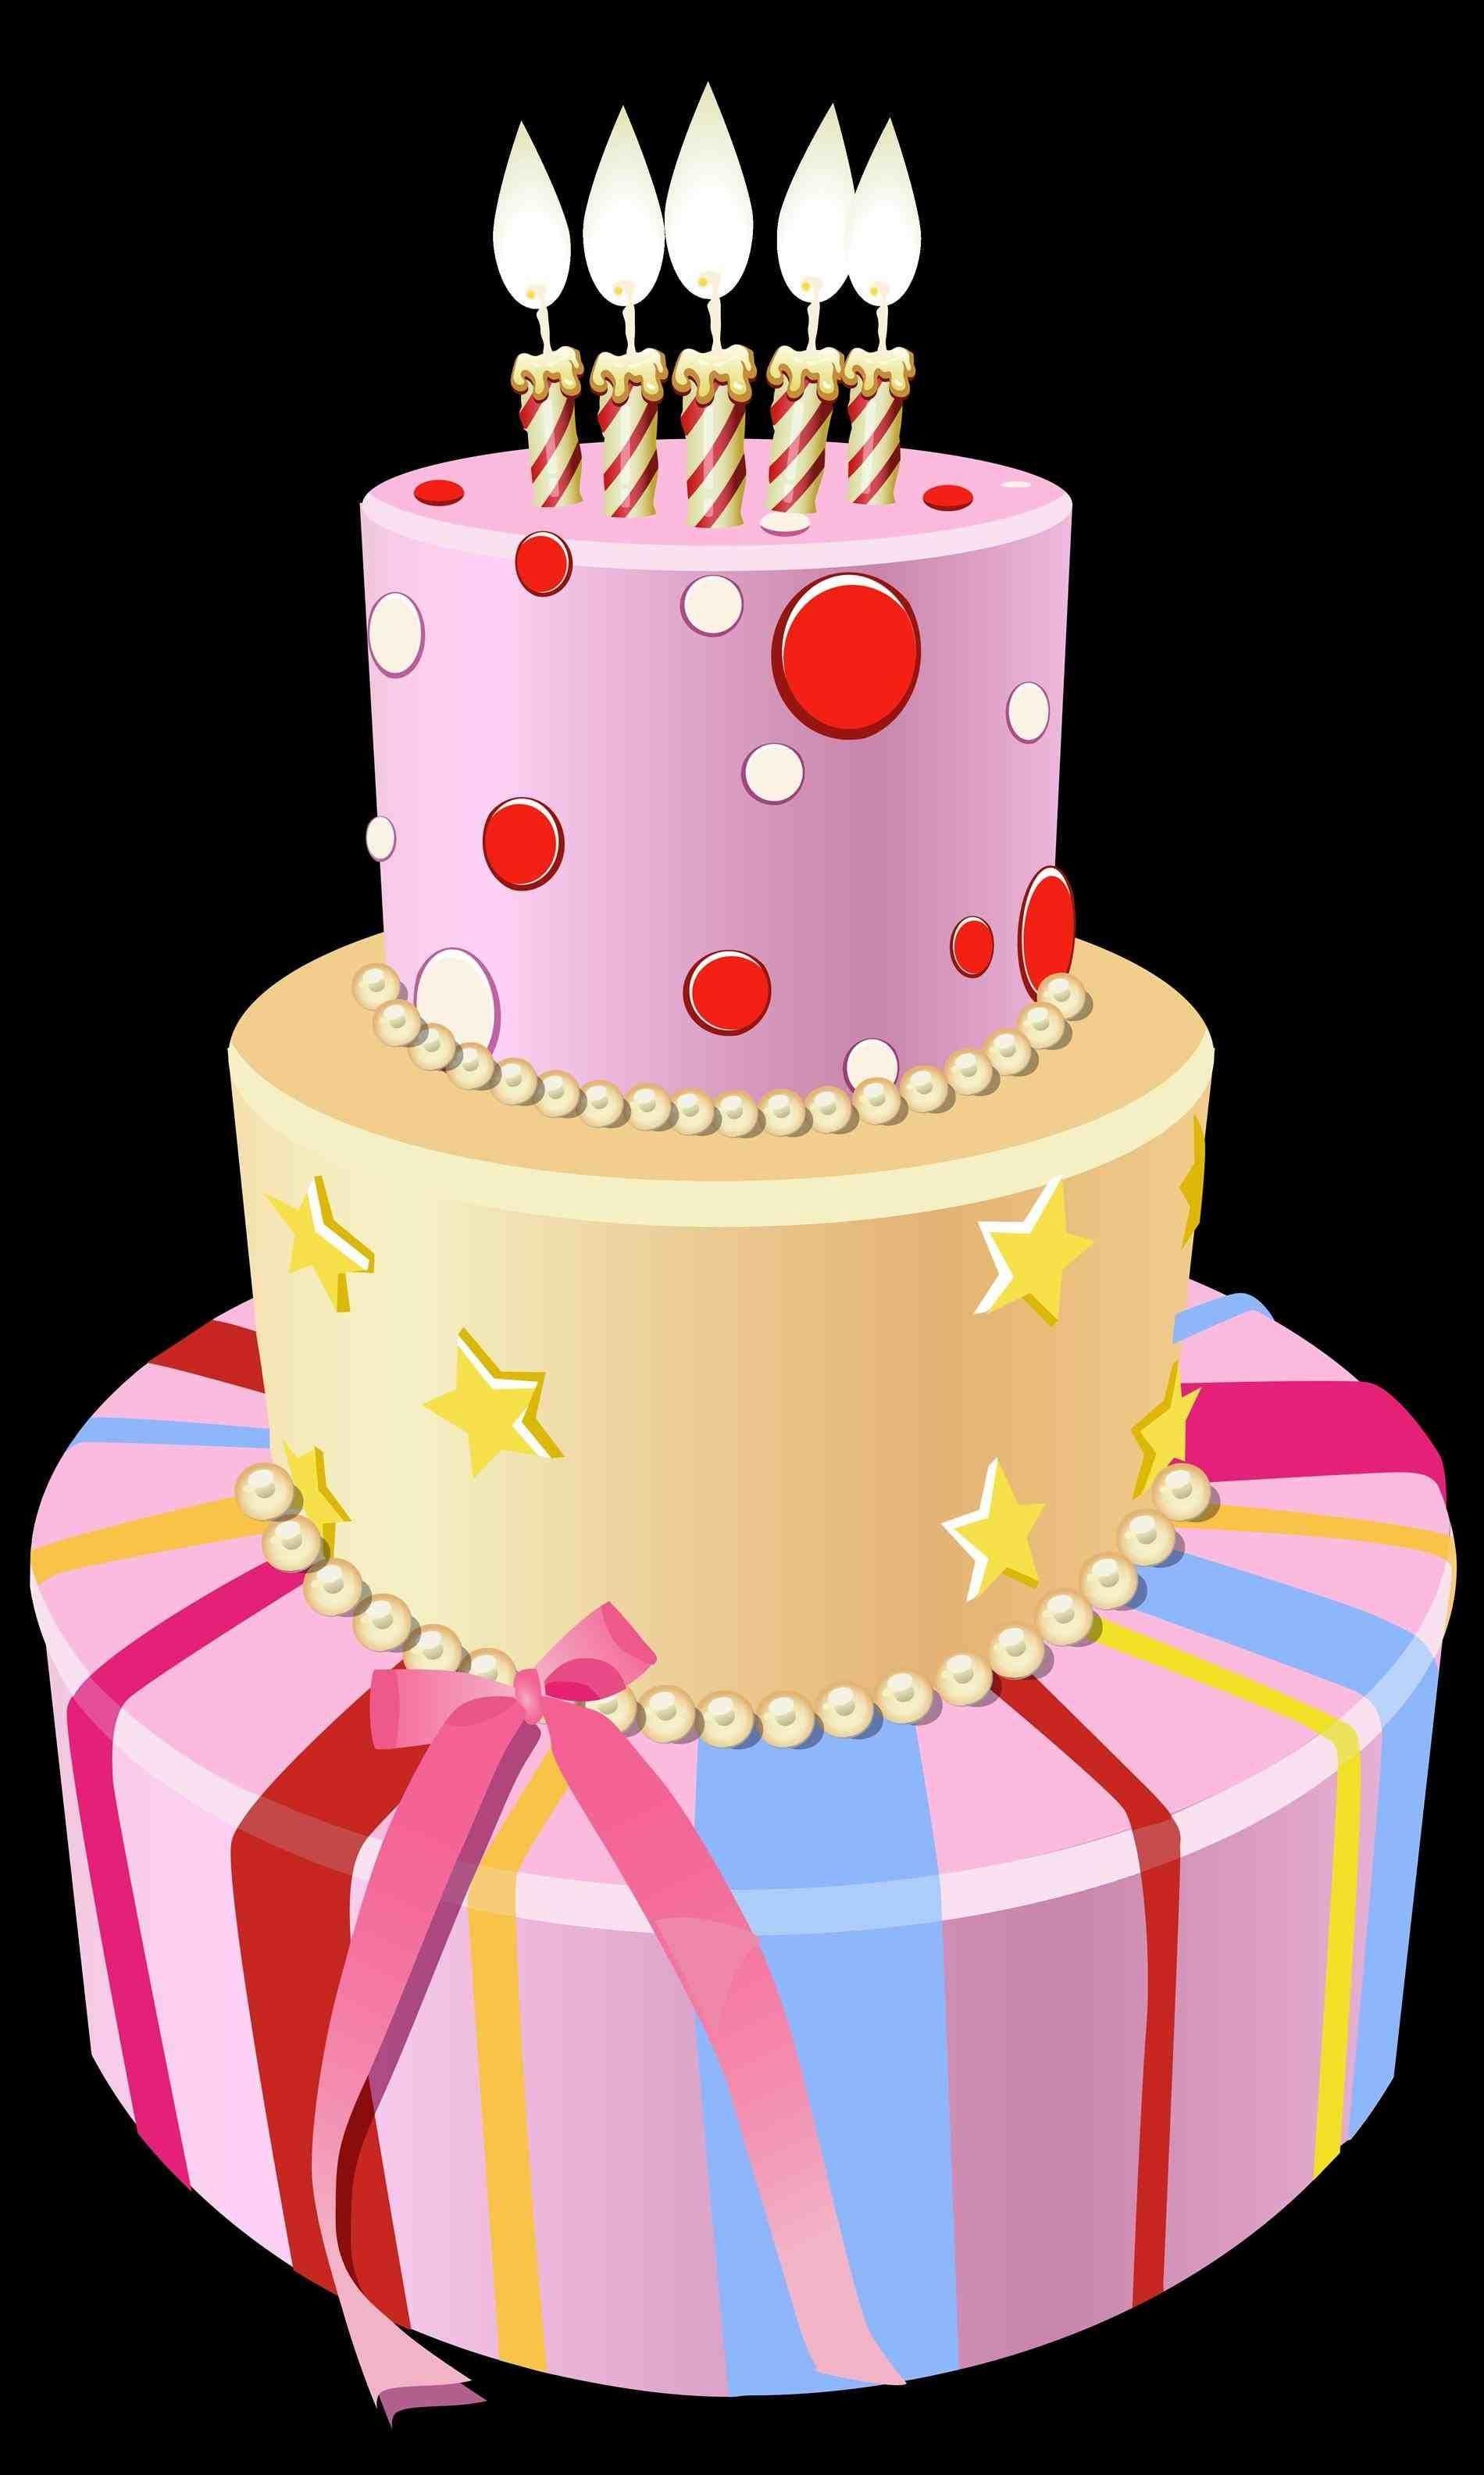 pink wedding cake clipart   Weddings   Pinterest   Wedding cake ...